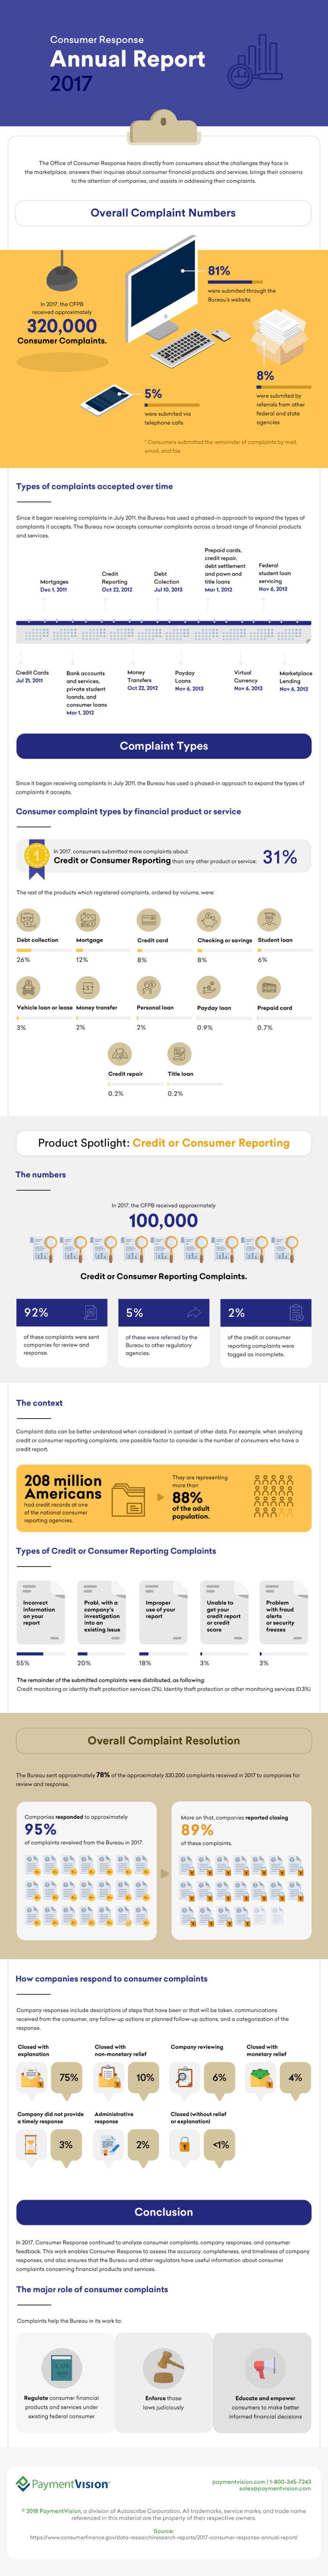 2017 CFPB Consumer Response Annual Report Infographic